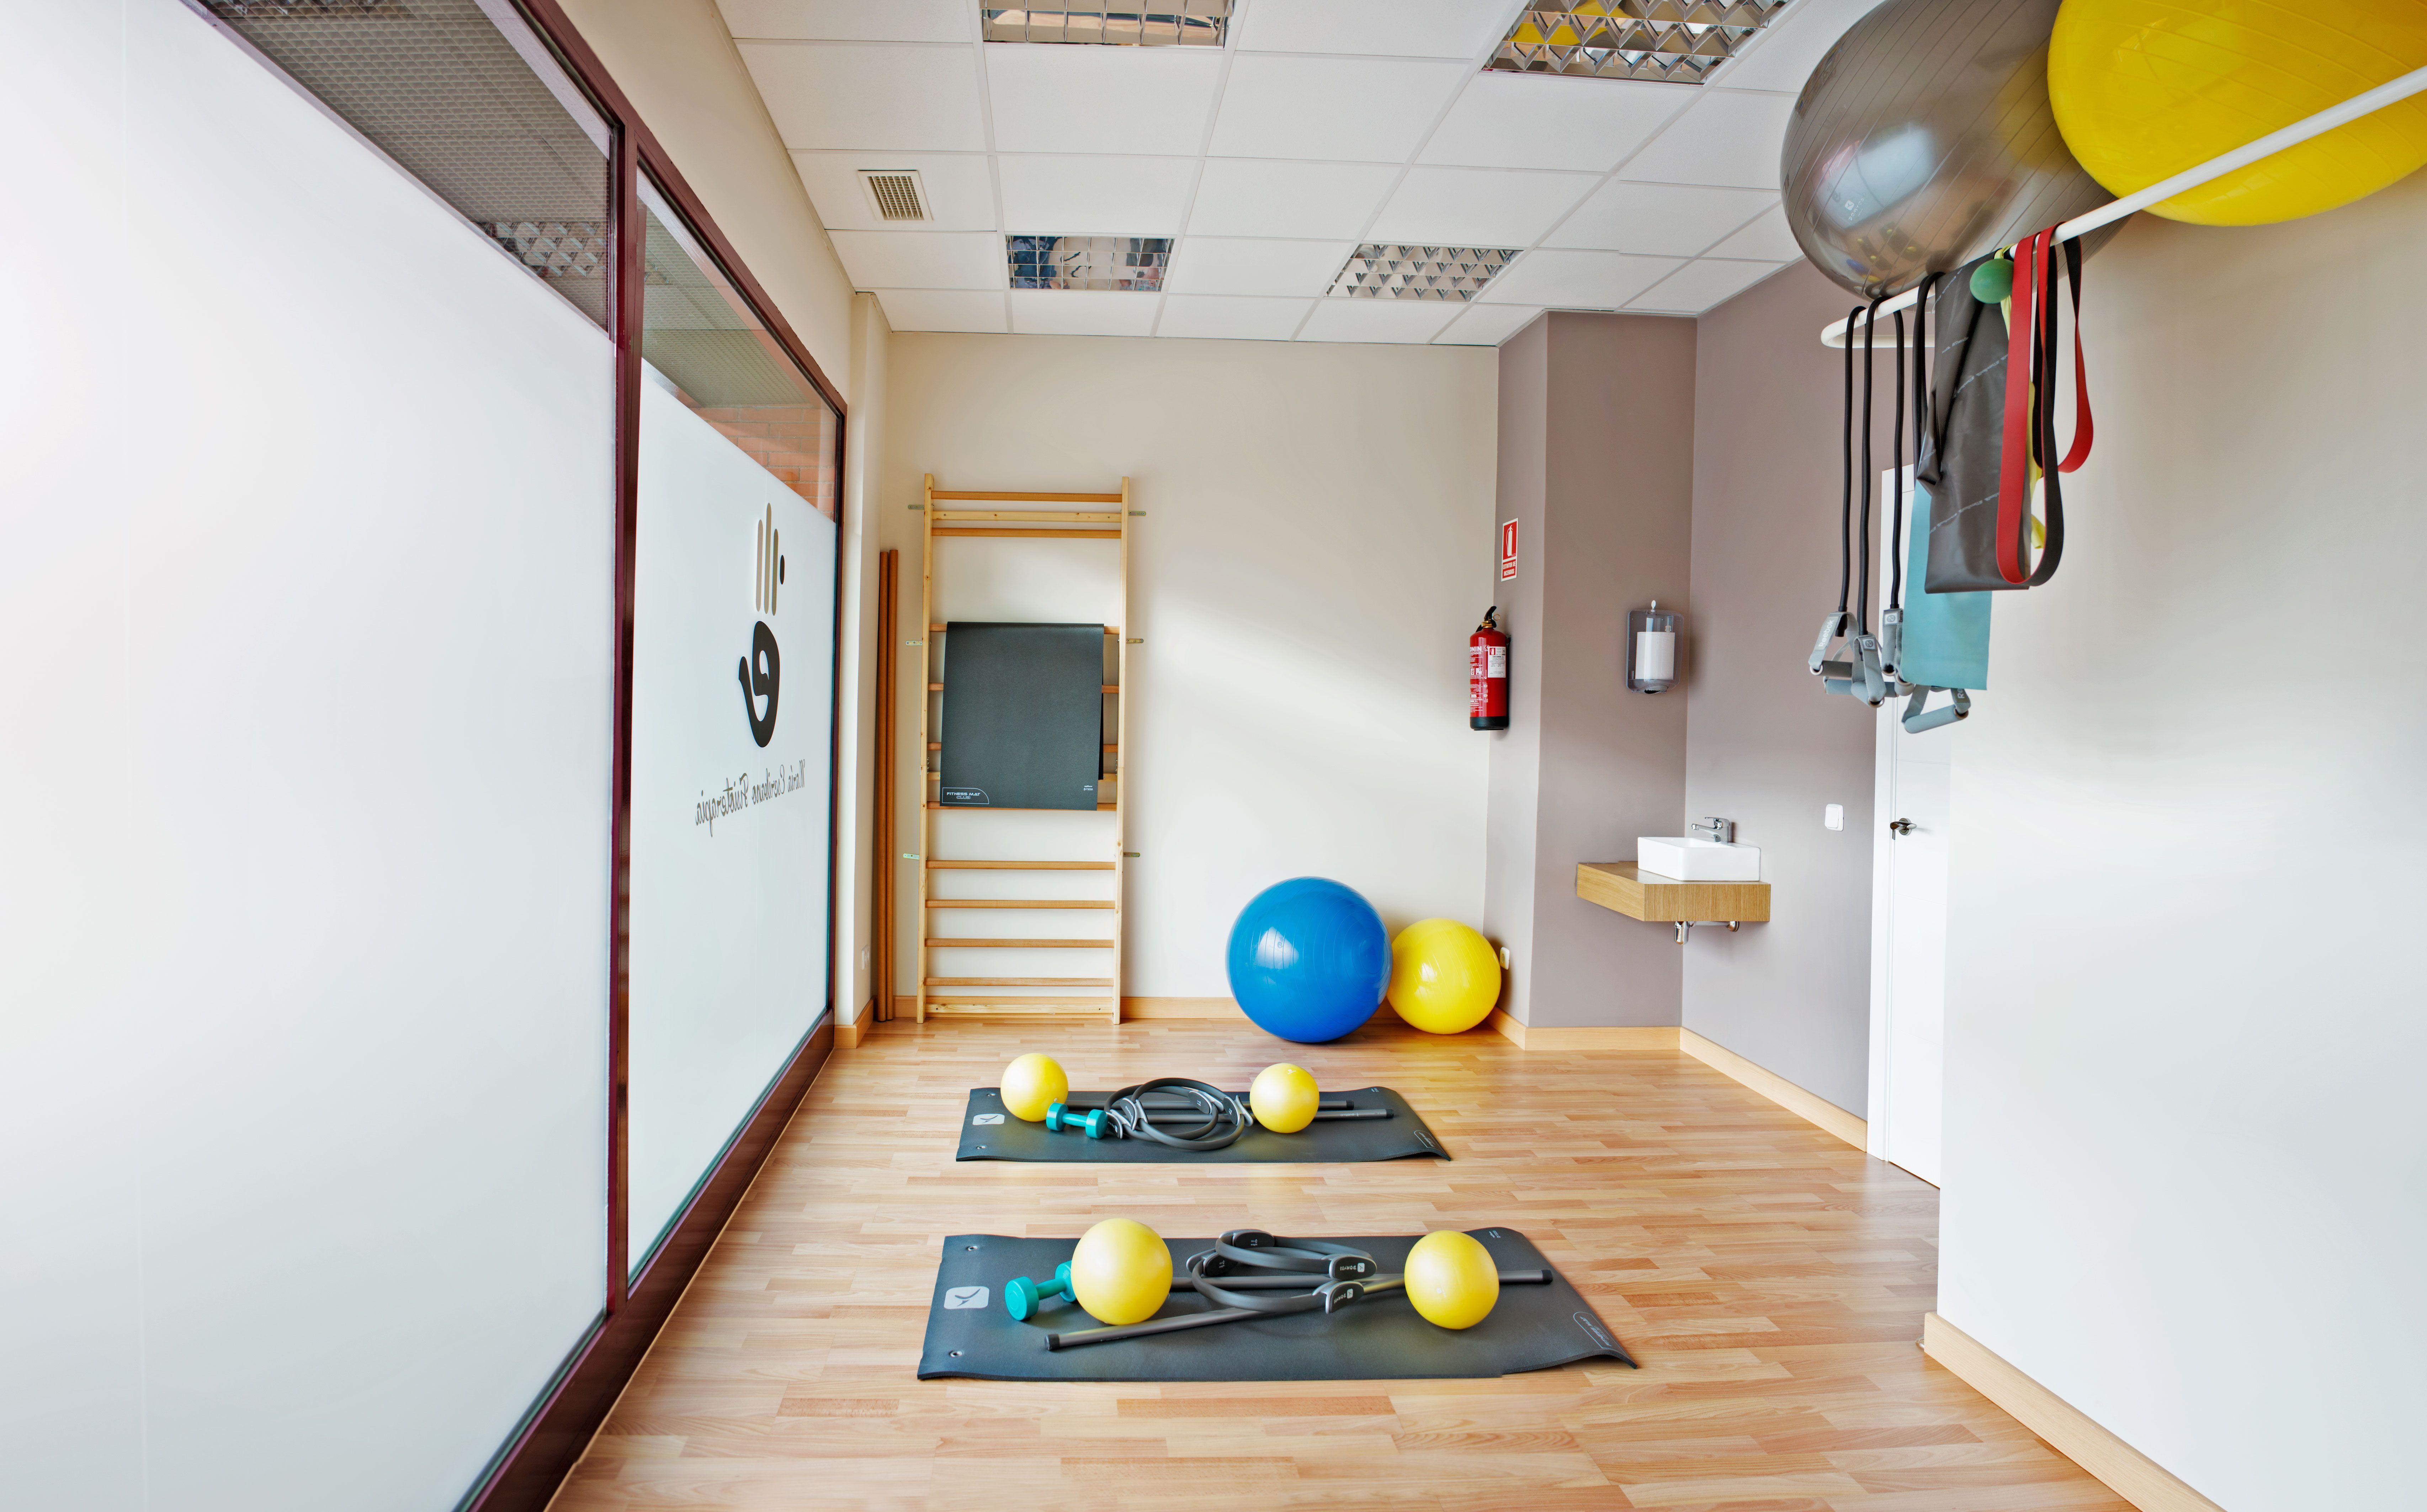 Gimnasio mar a escribano fisioterapia cabinet kin for Gimnasio kine